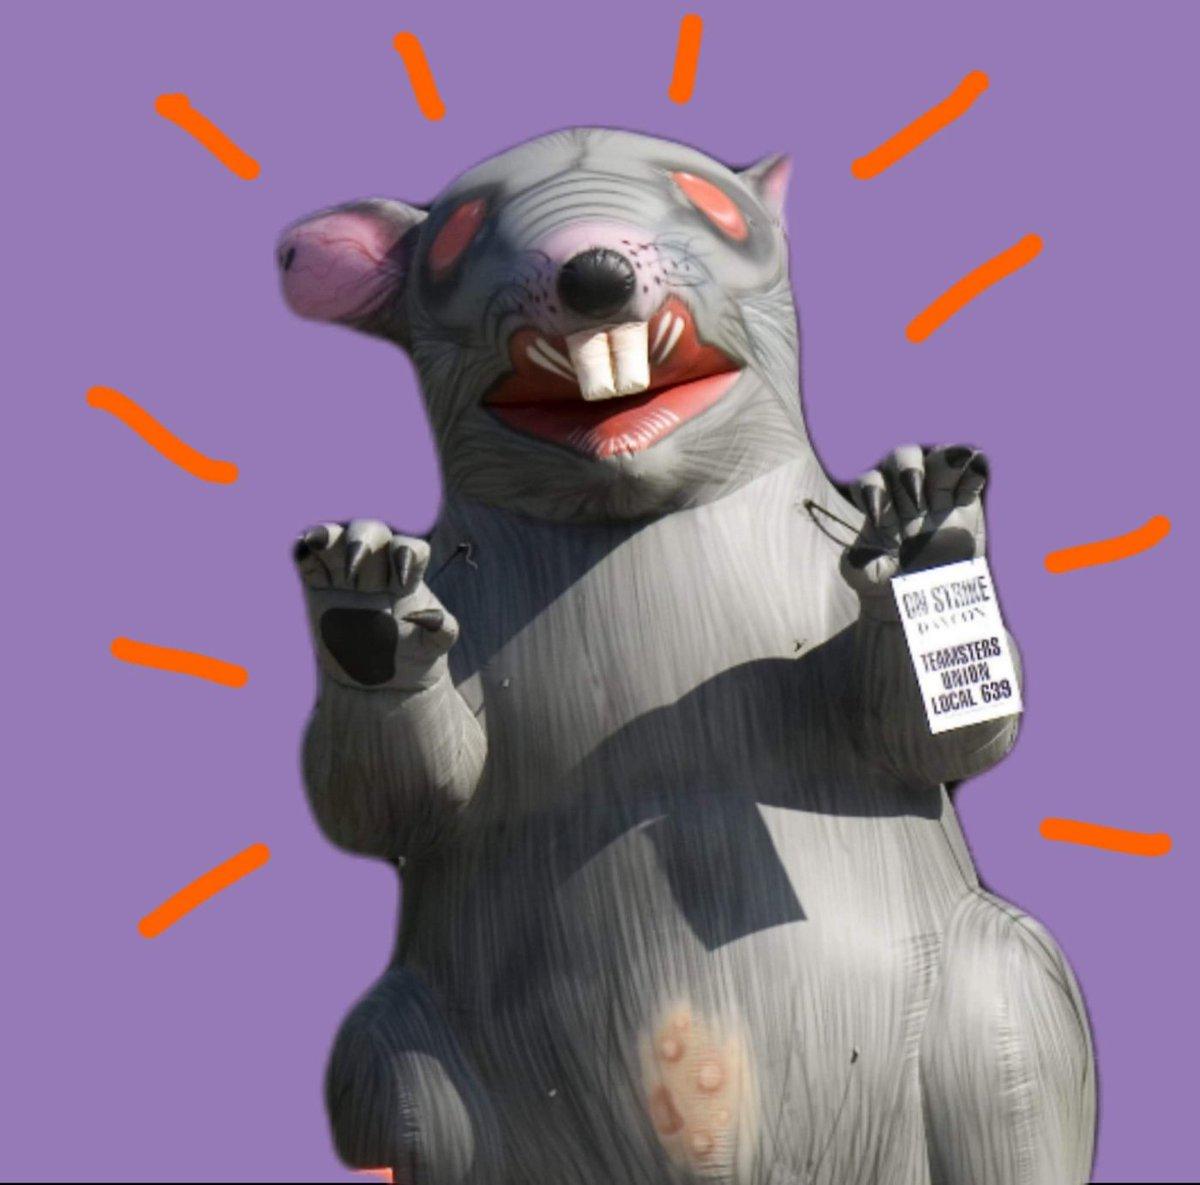 @GrimKim's photo on Scabby